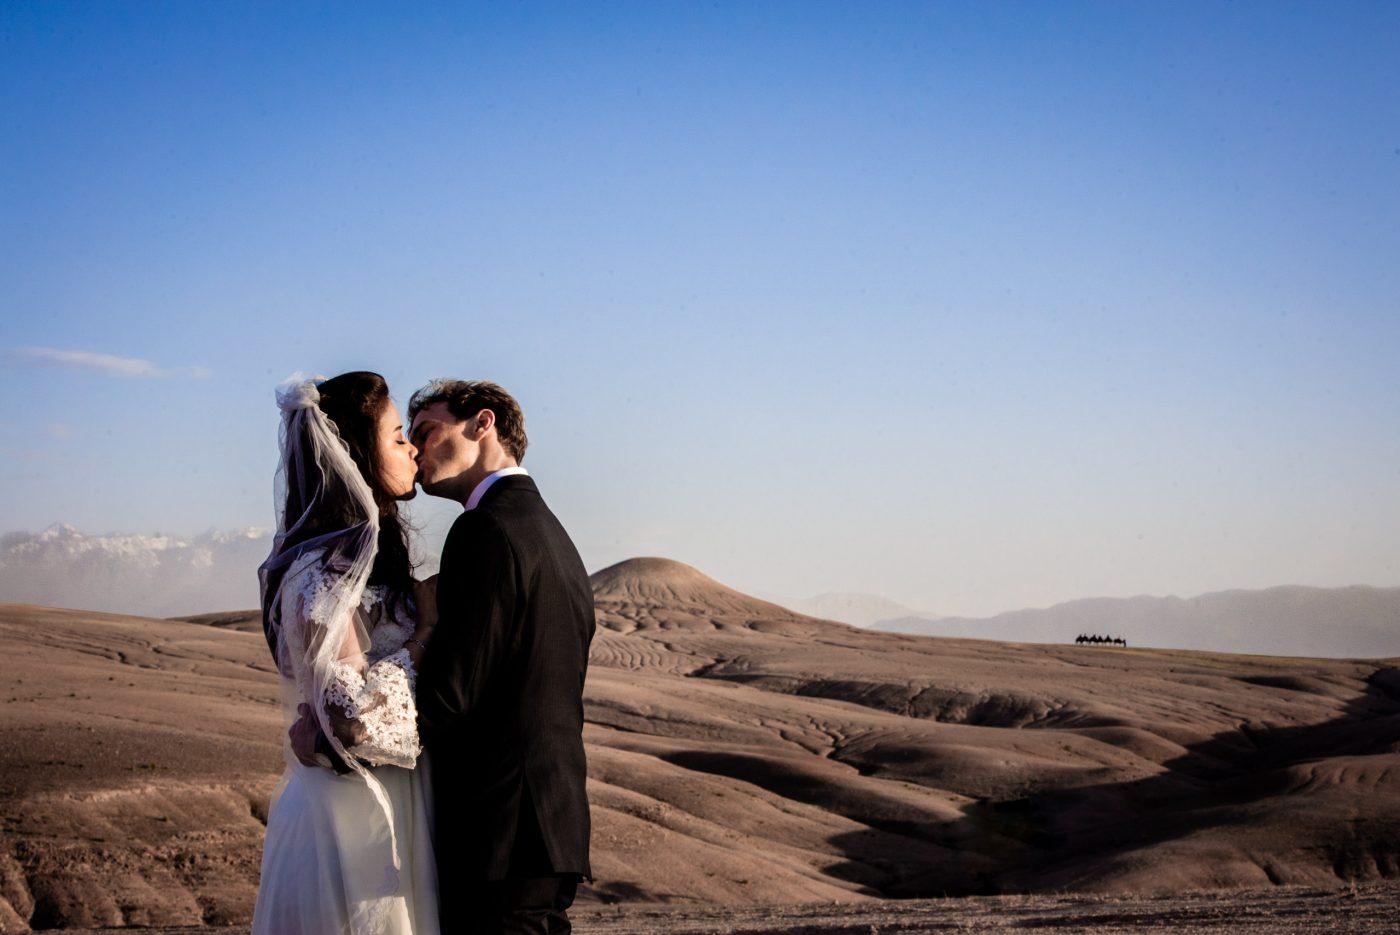 Beautiful Destination Wedding photography in Agafay Desert marrakech.